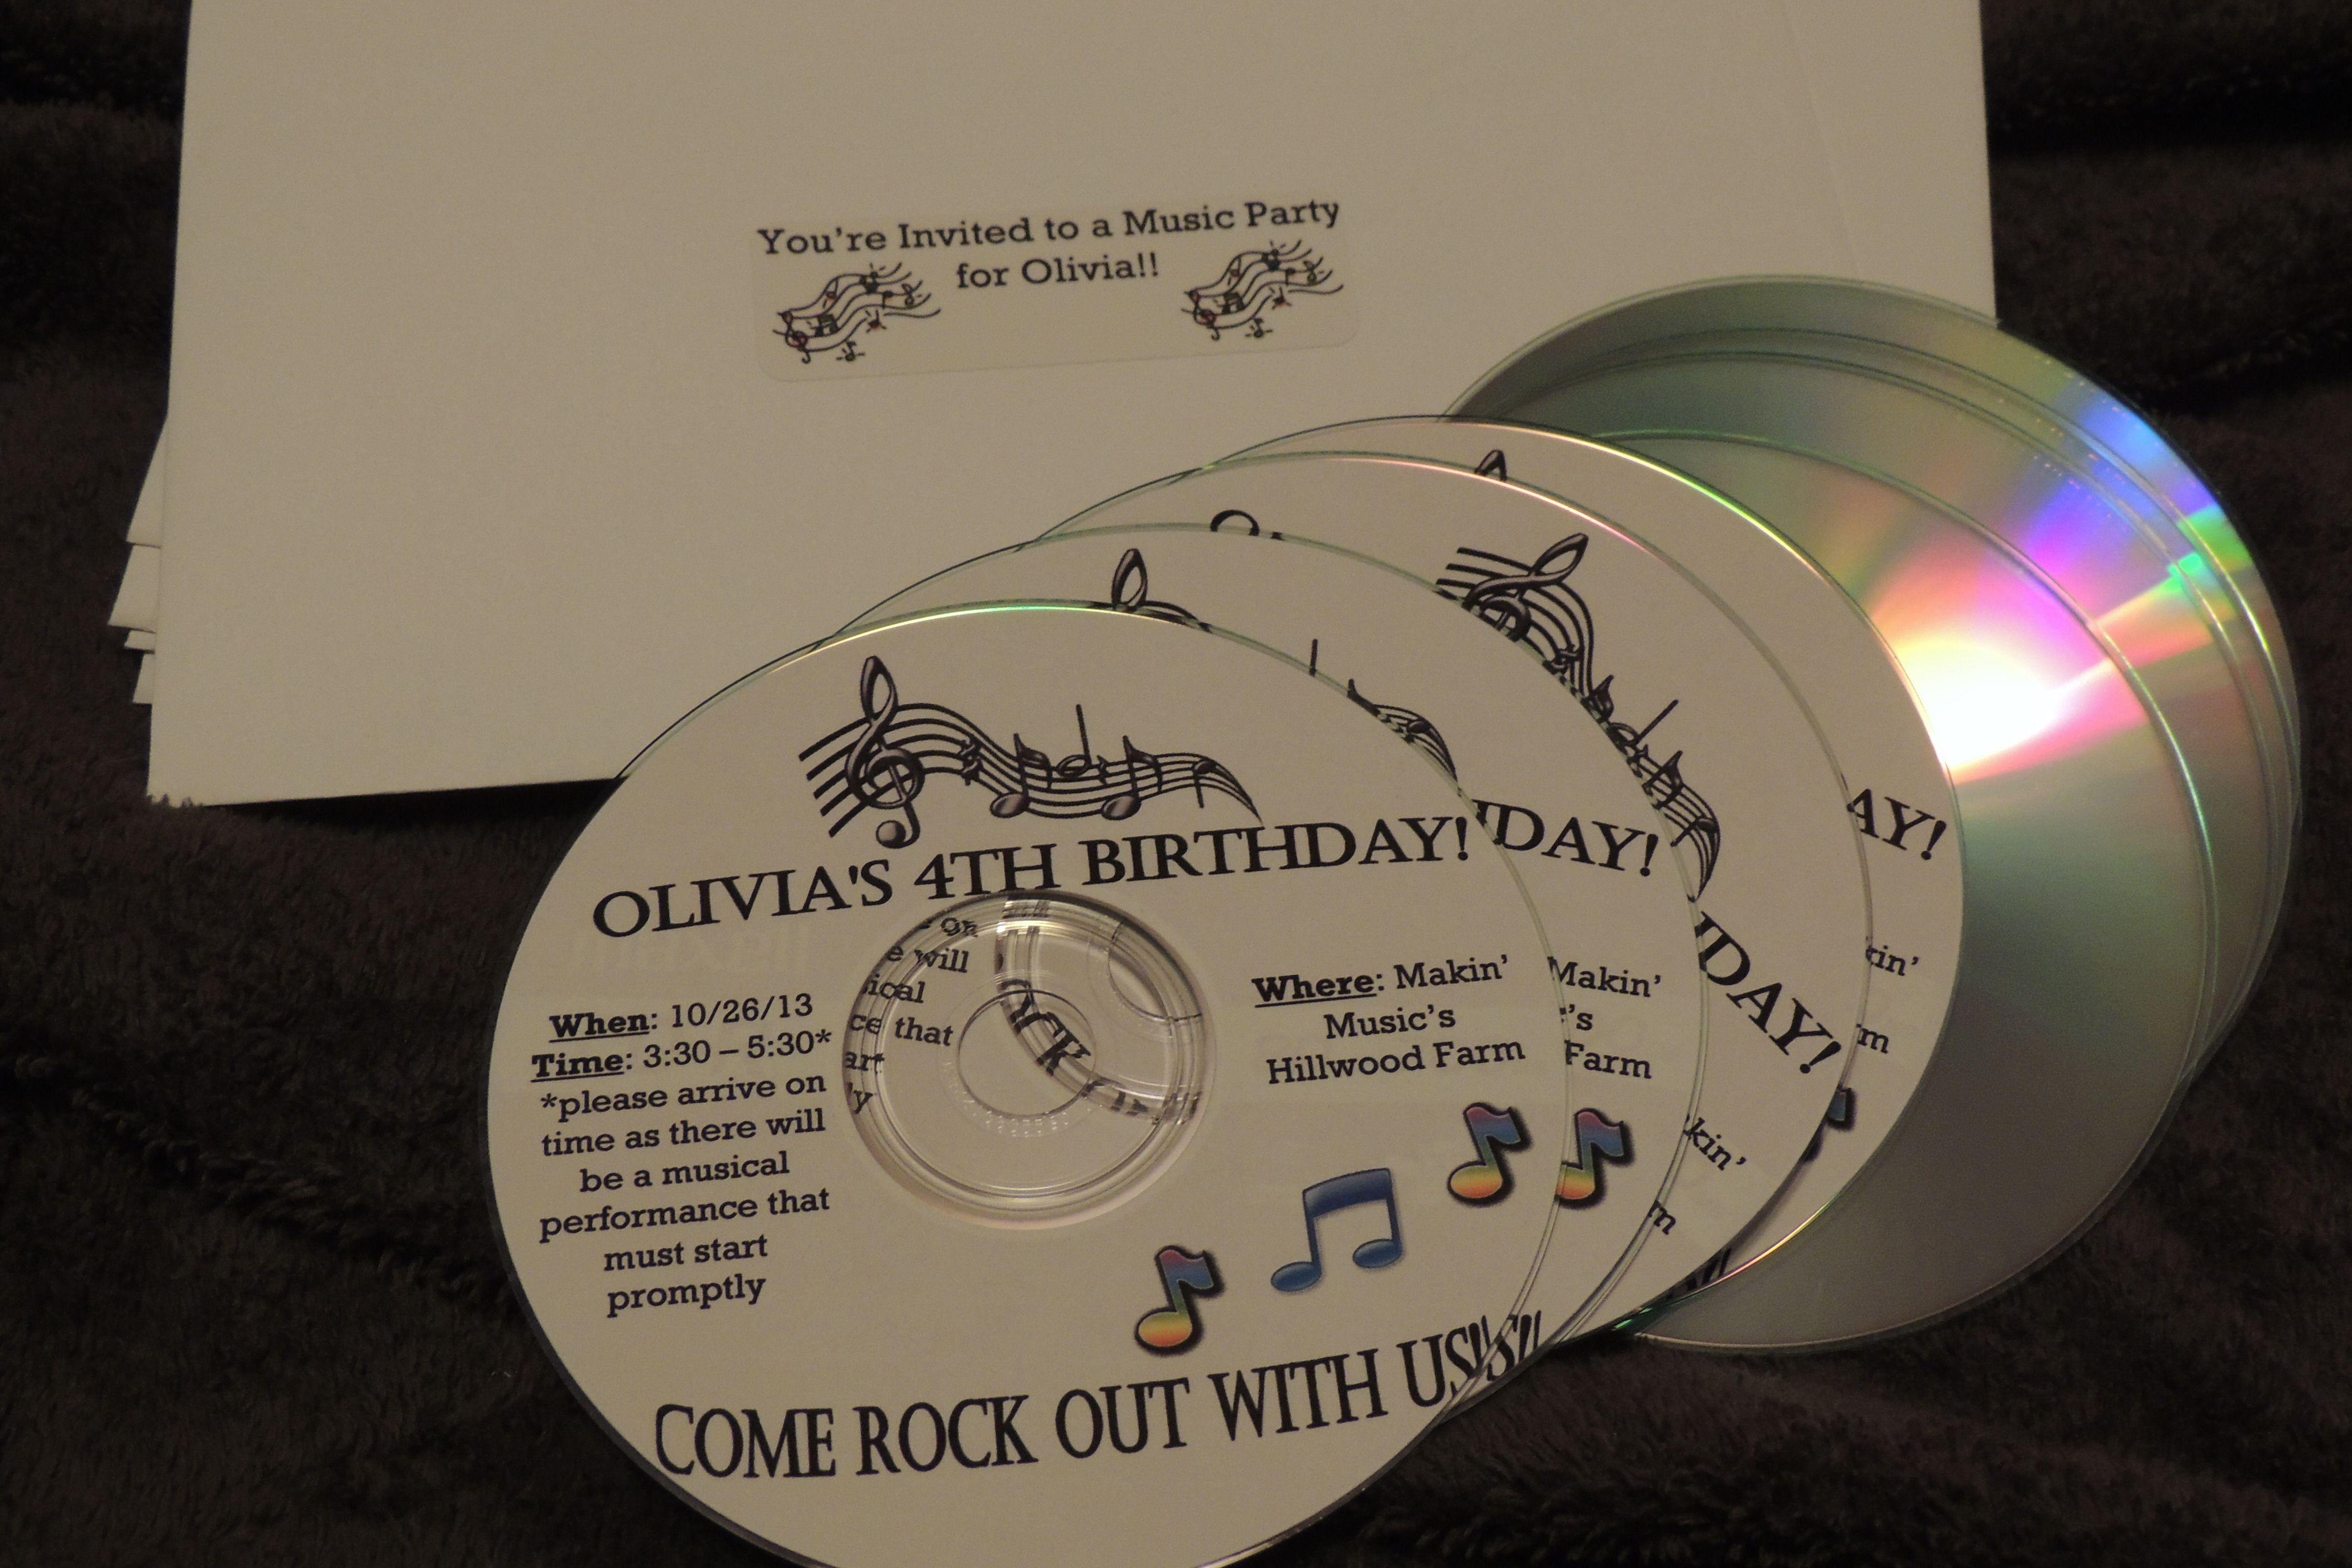 Music birthday party invitation Print using CD labelsbe creative